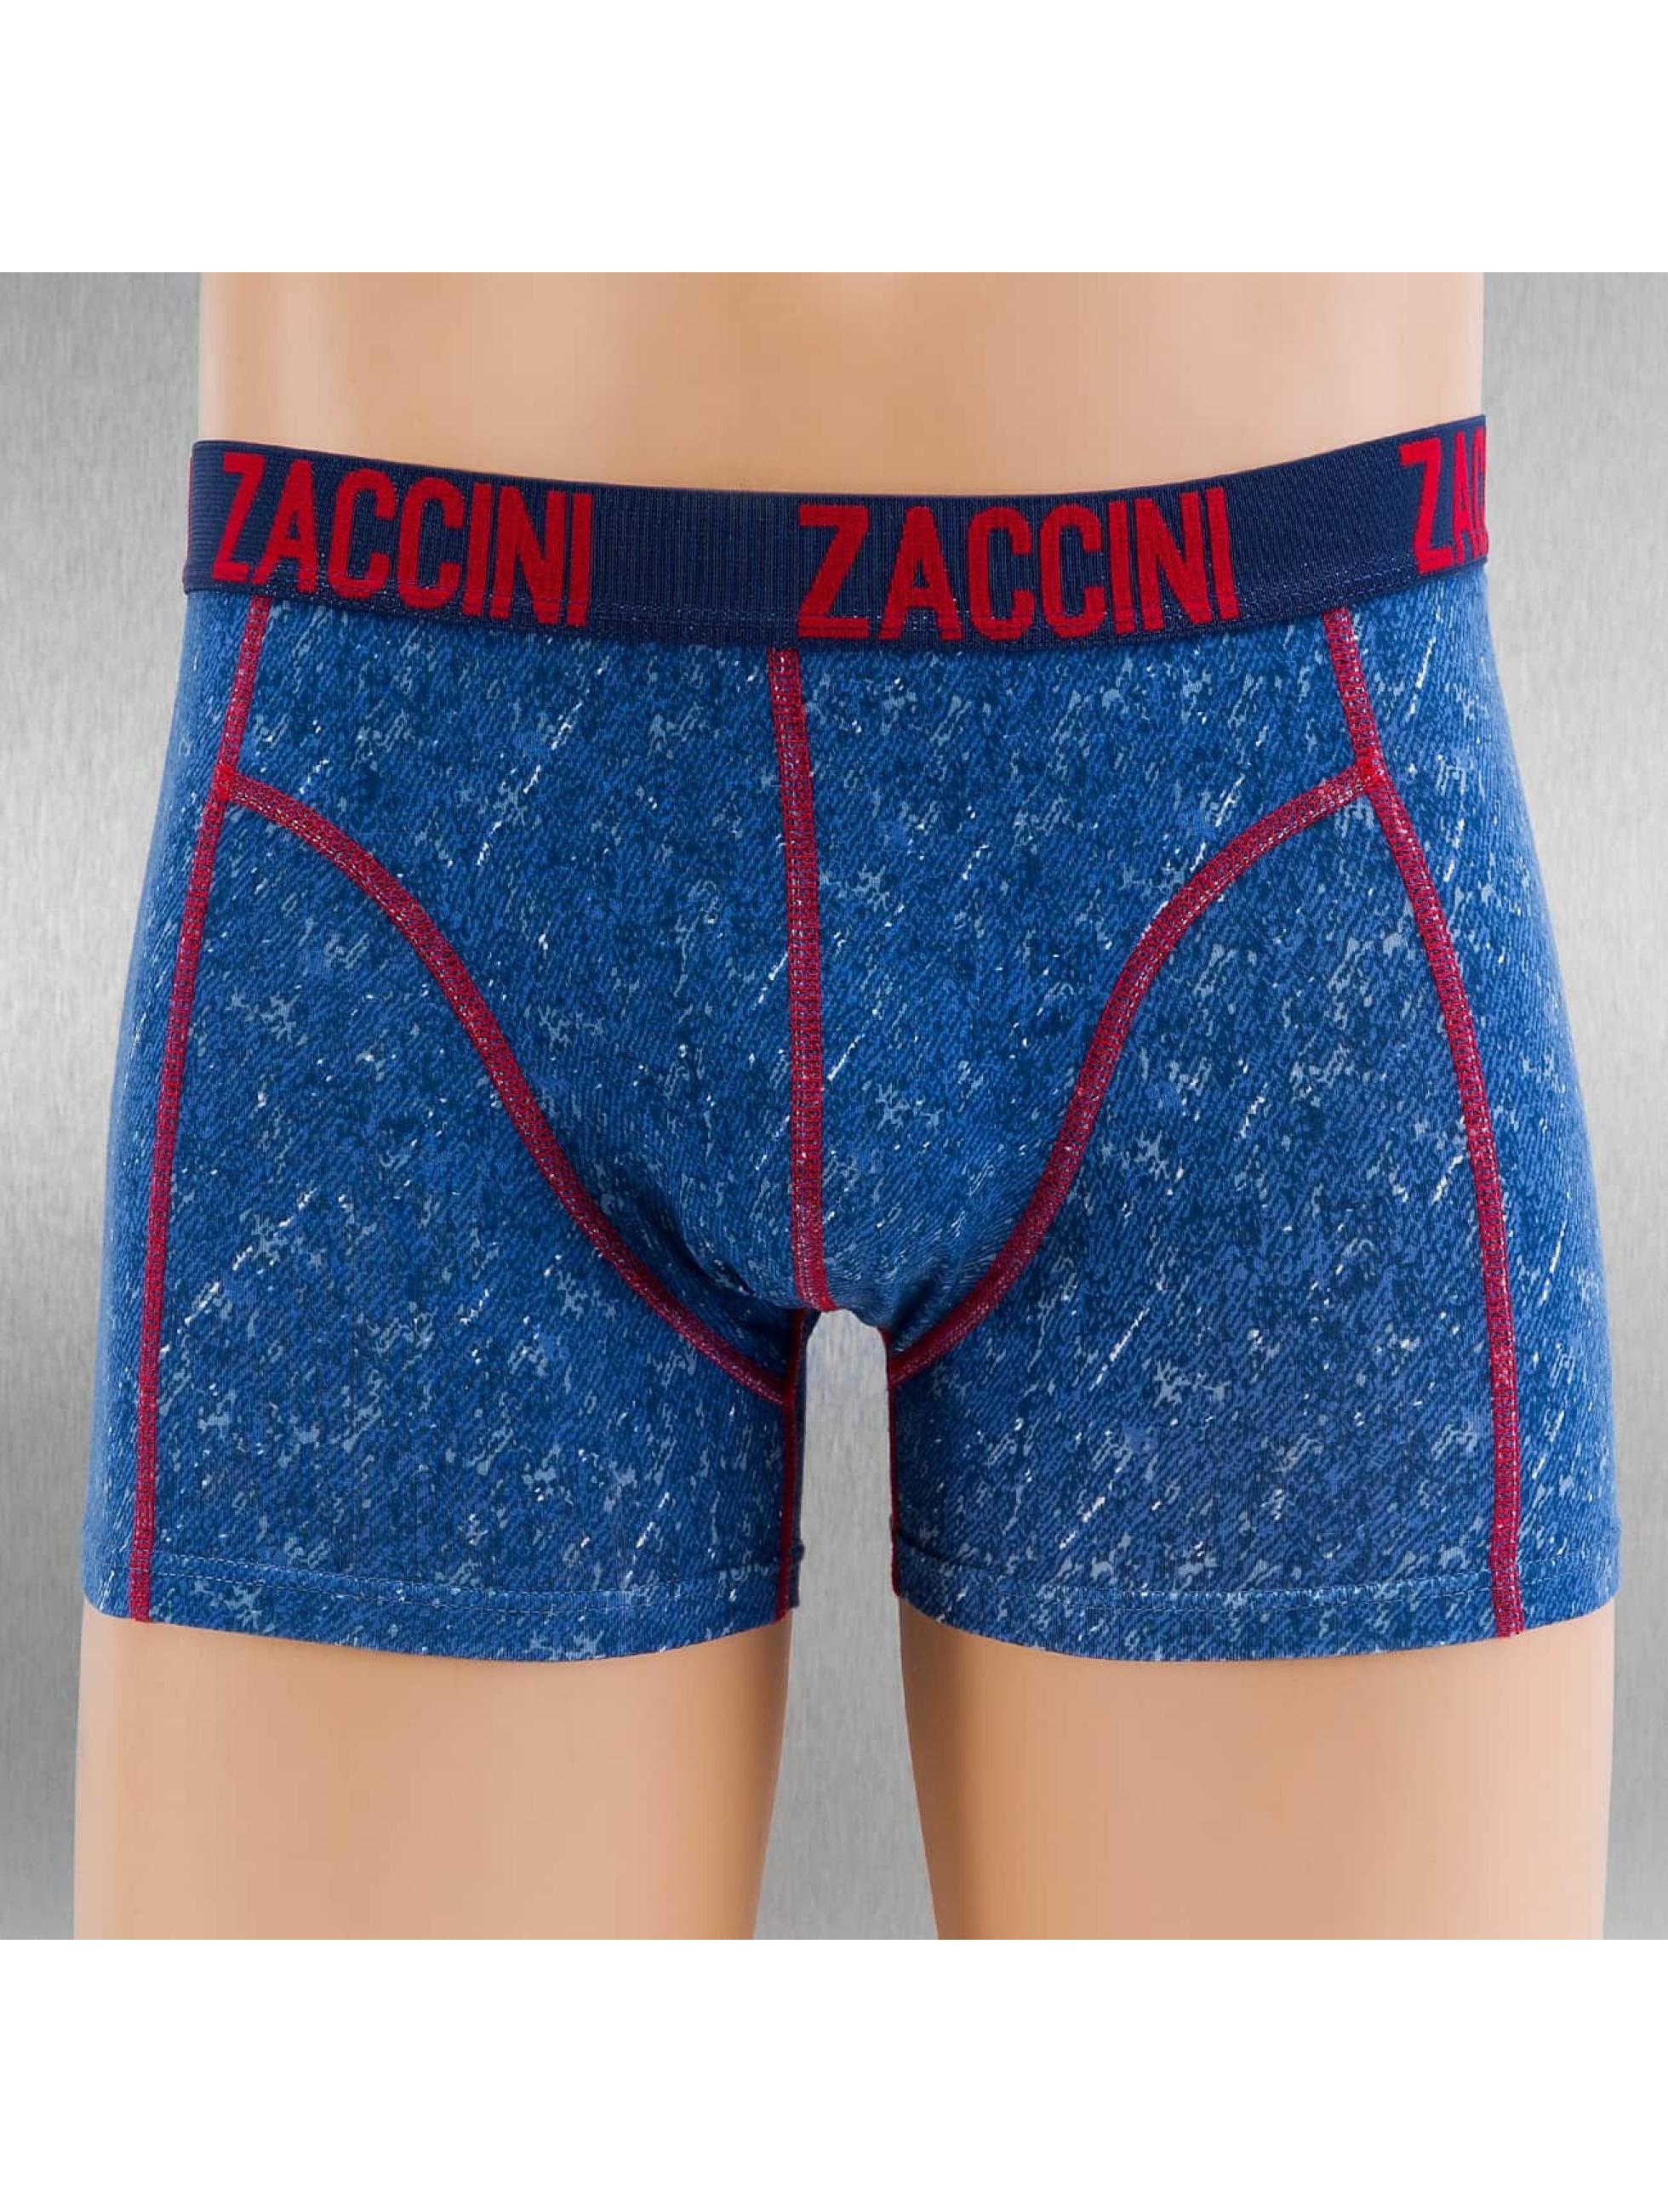 Zaccini  Shorts boxeros Denim 2-Pack azul